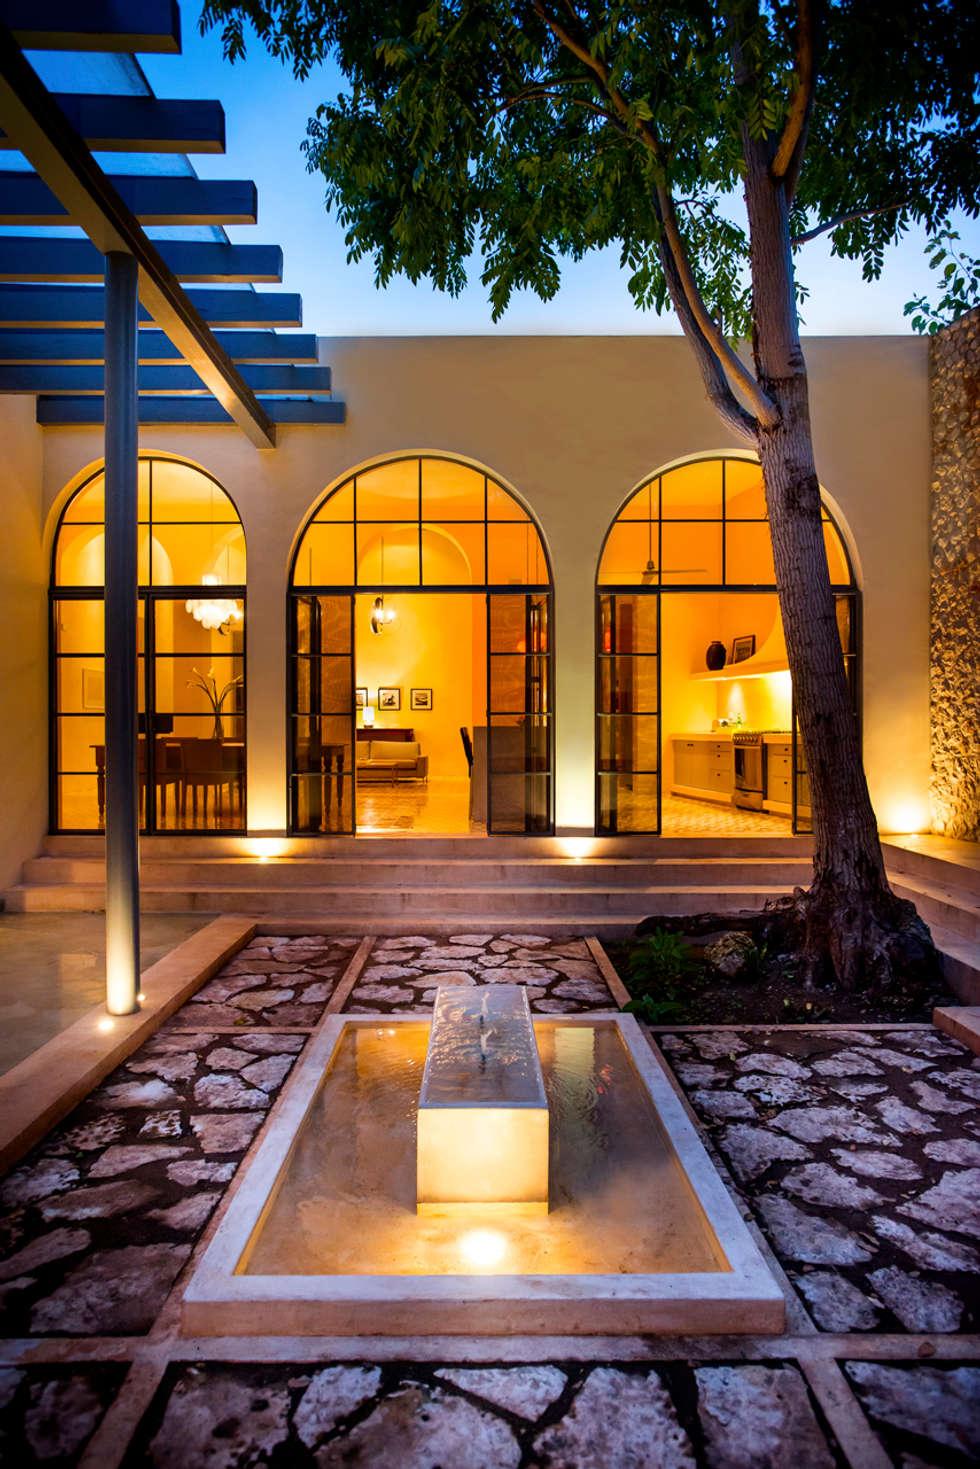 Interior design ideas architecture and renovating photos for Estilo colonial